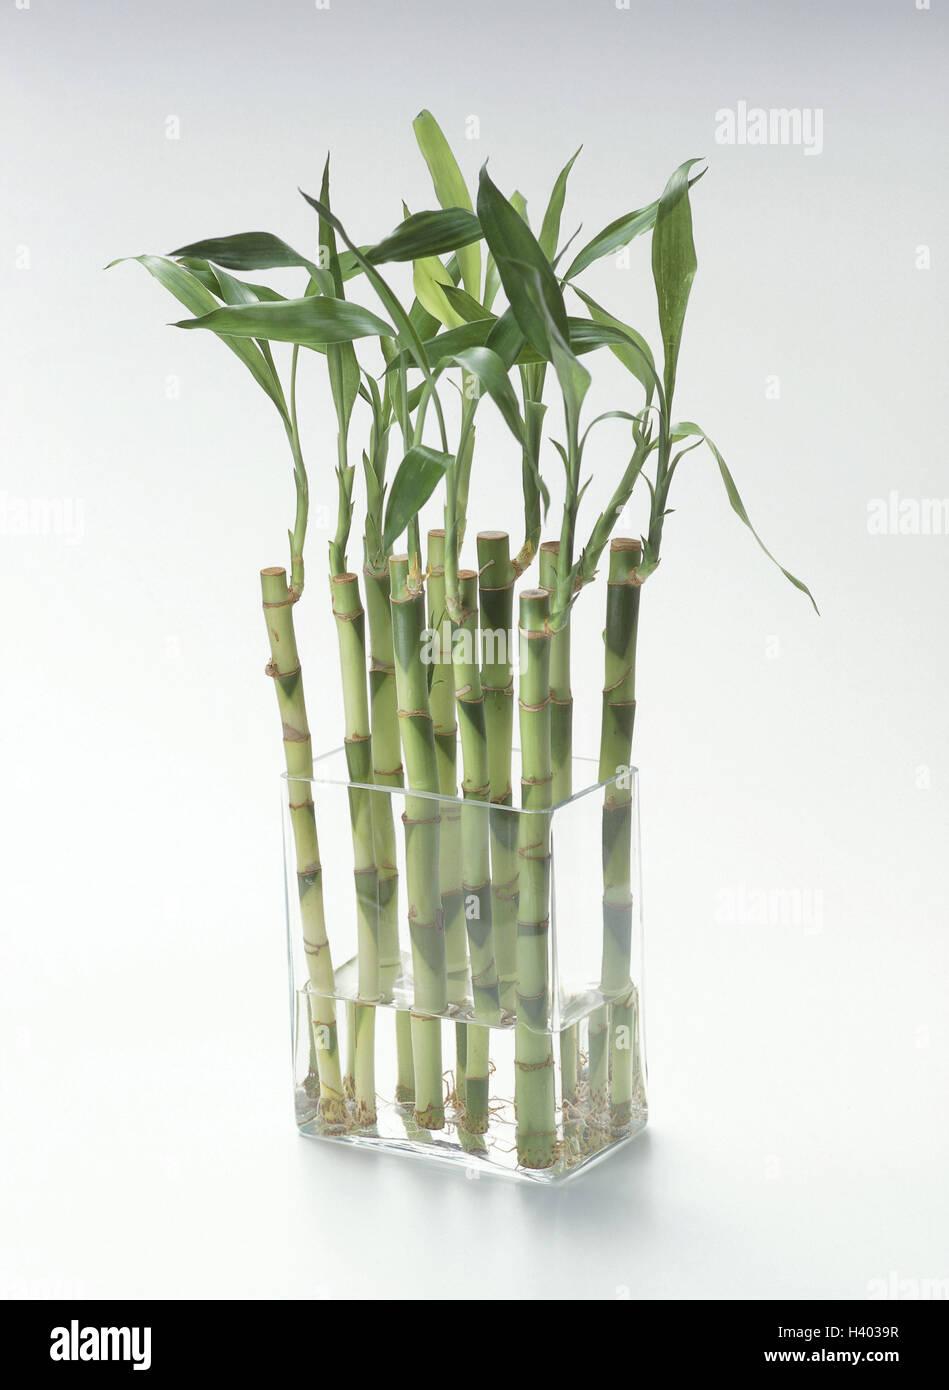 2 unique vase for bamboo plant home idea vase lucky bamboo glass glass vase bamboo bambusa reviewsmspy